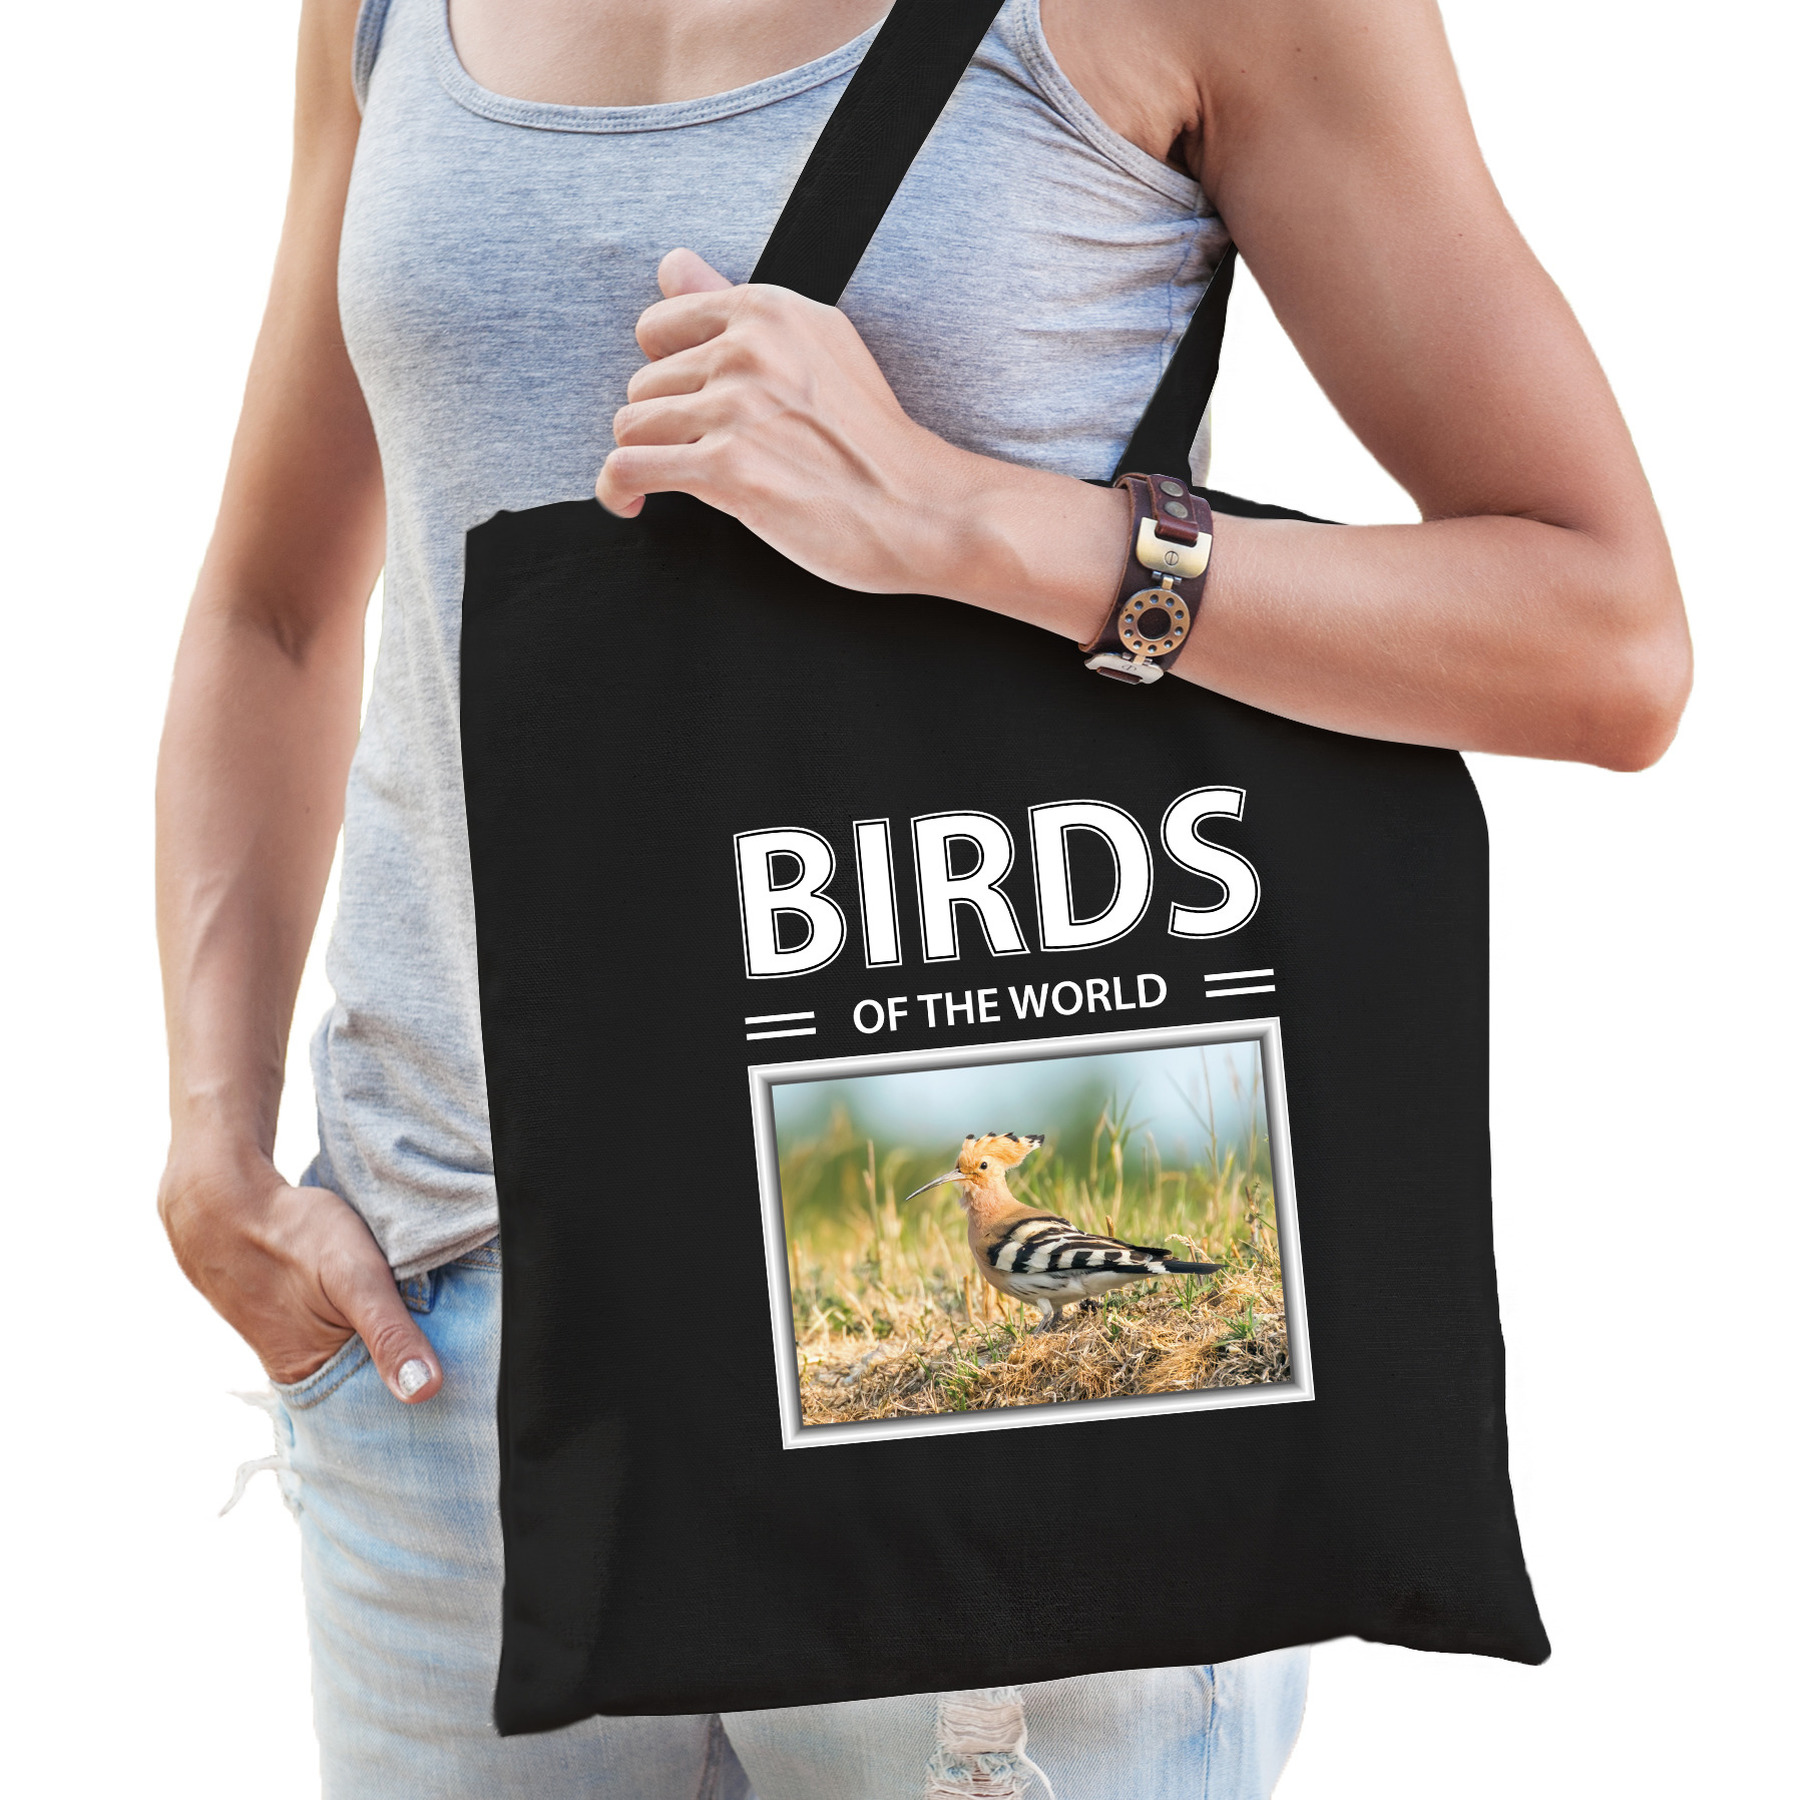 Katoenen tasje Hop vogels zwart - birds of the world Hop cadeau tas